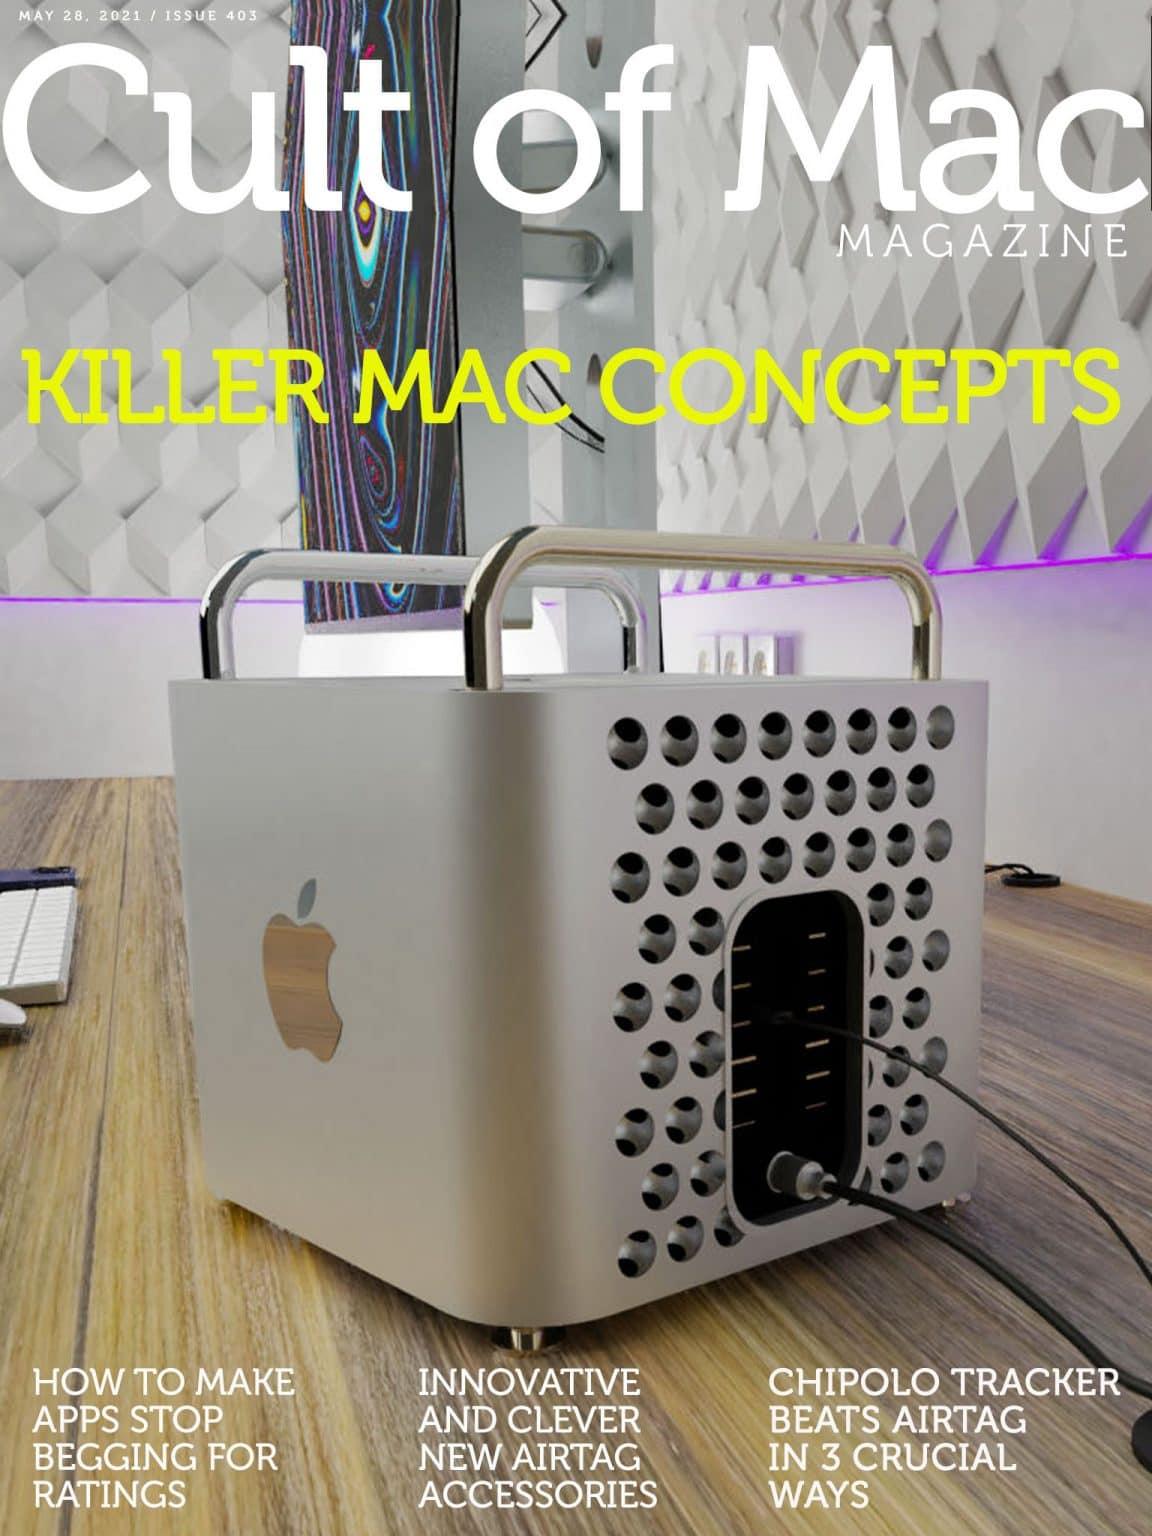 Killer Mac concepts: Ready to visual the future?